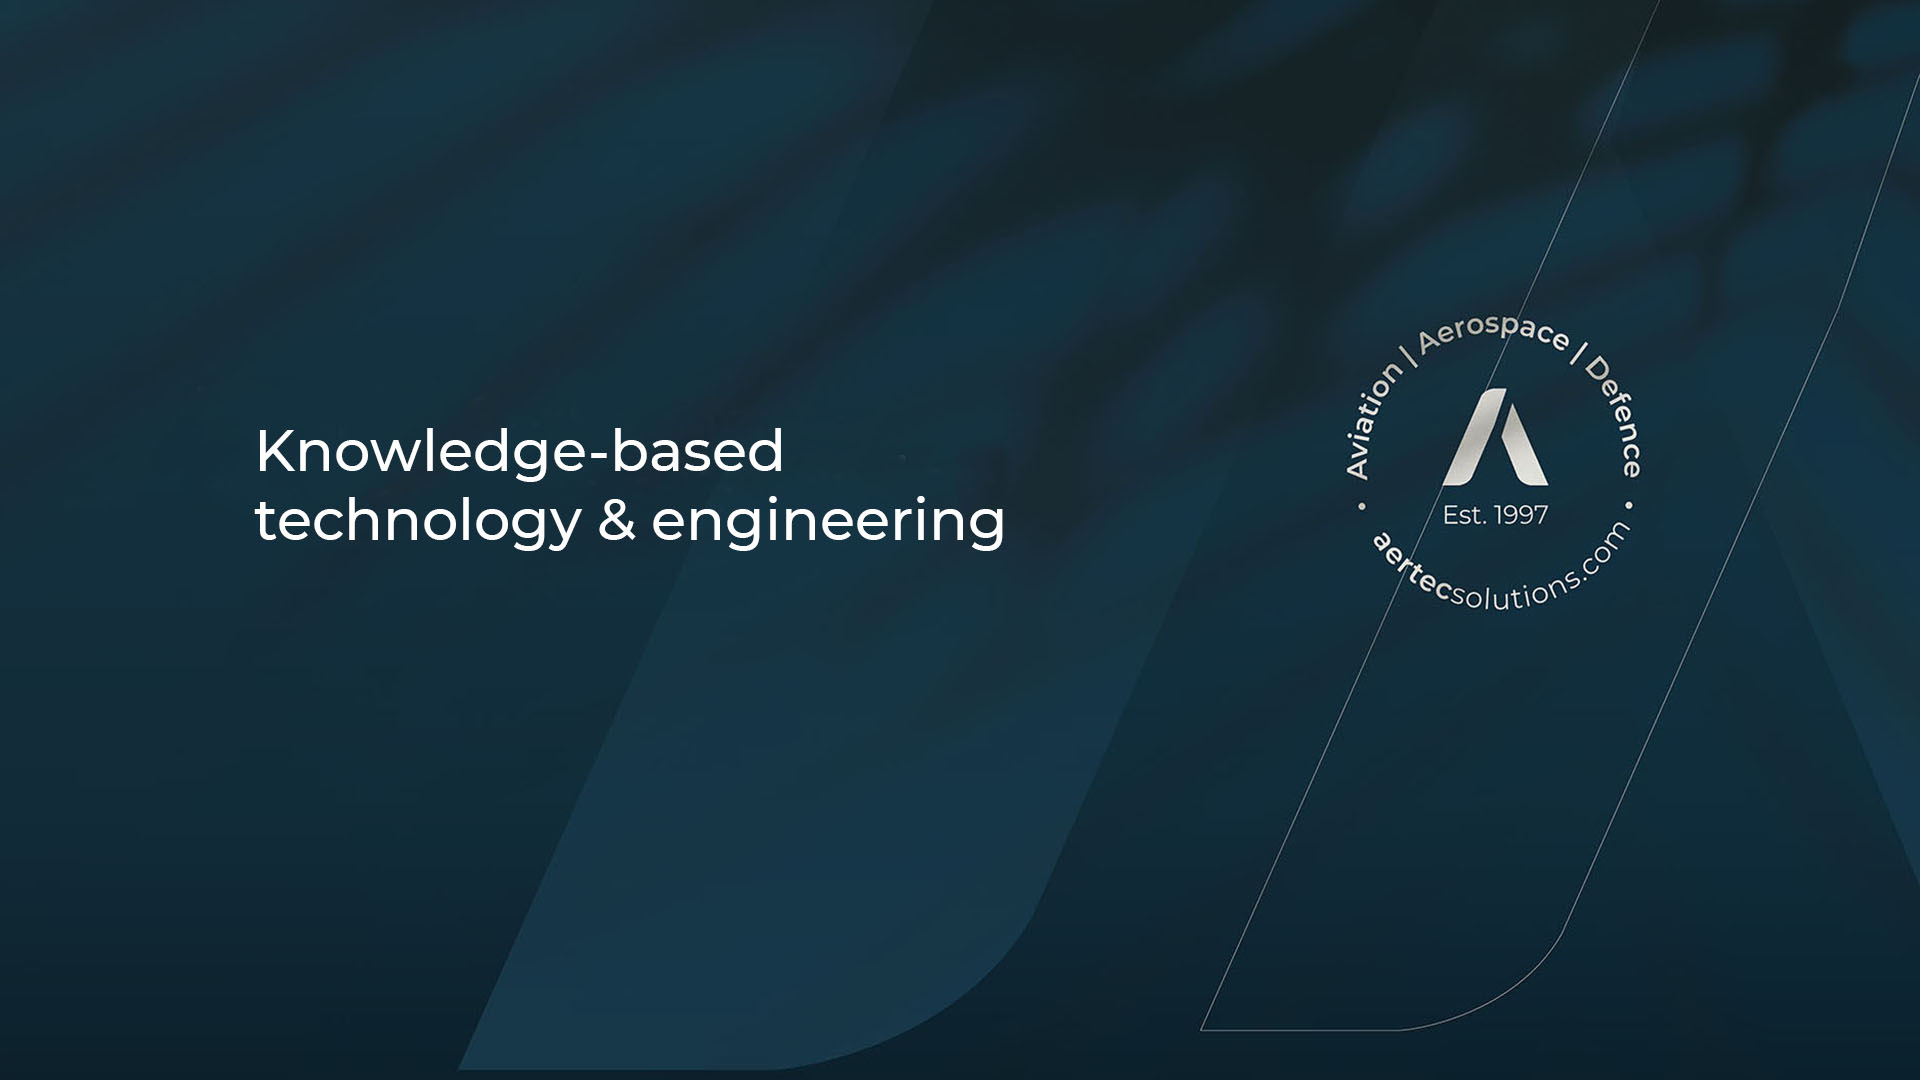 AERTEC - Knowledge-based technology & engineering